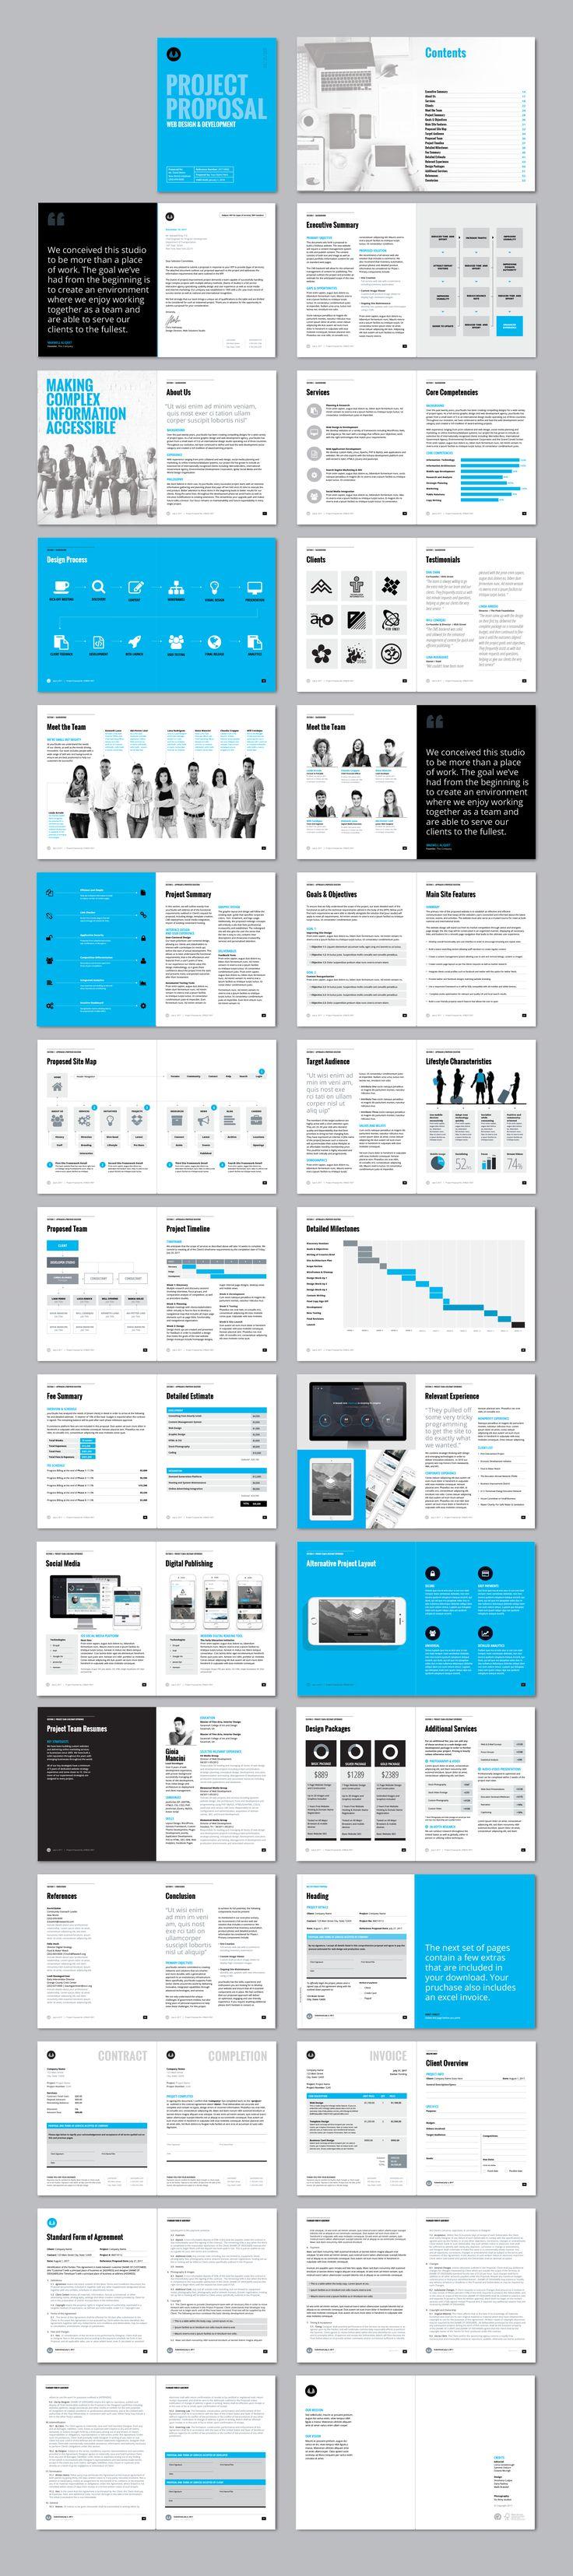 Instruction manual template word 5892655 hitori49info